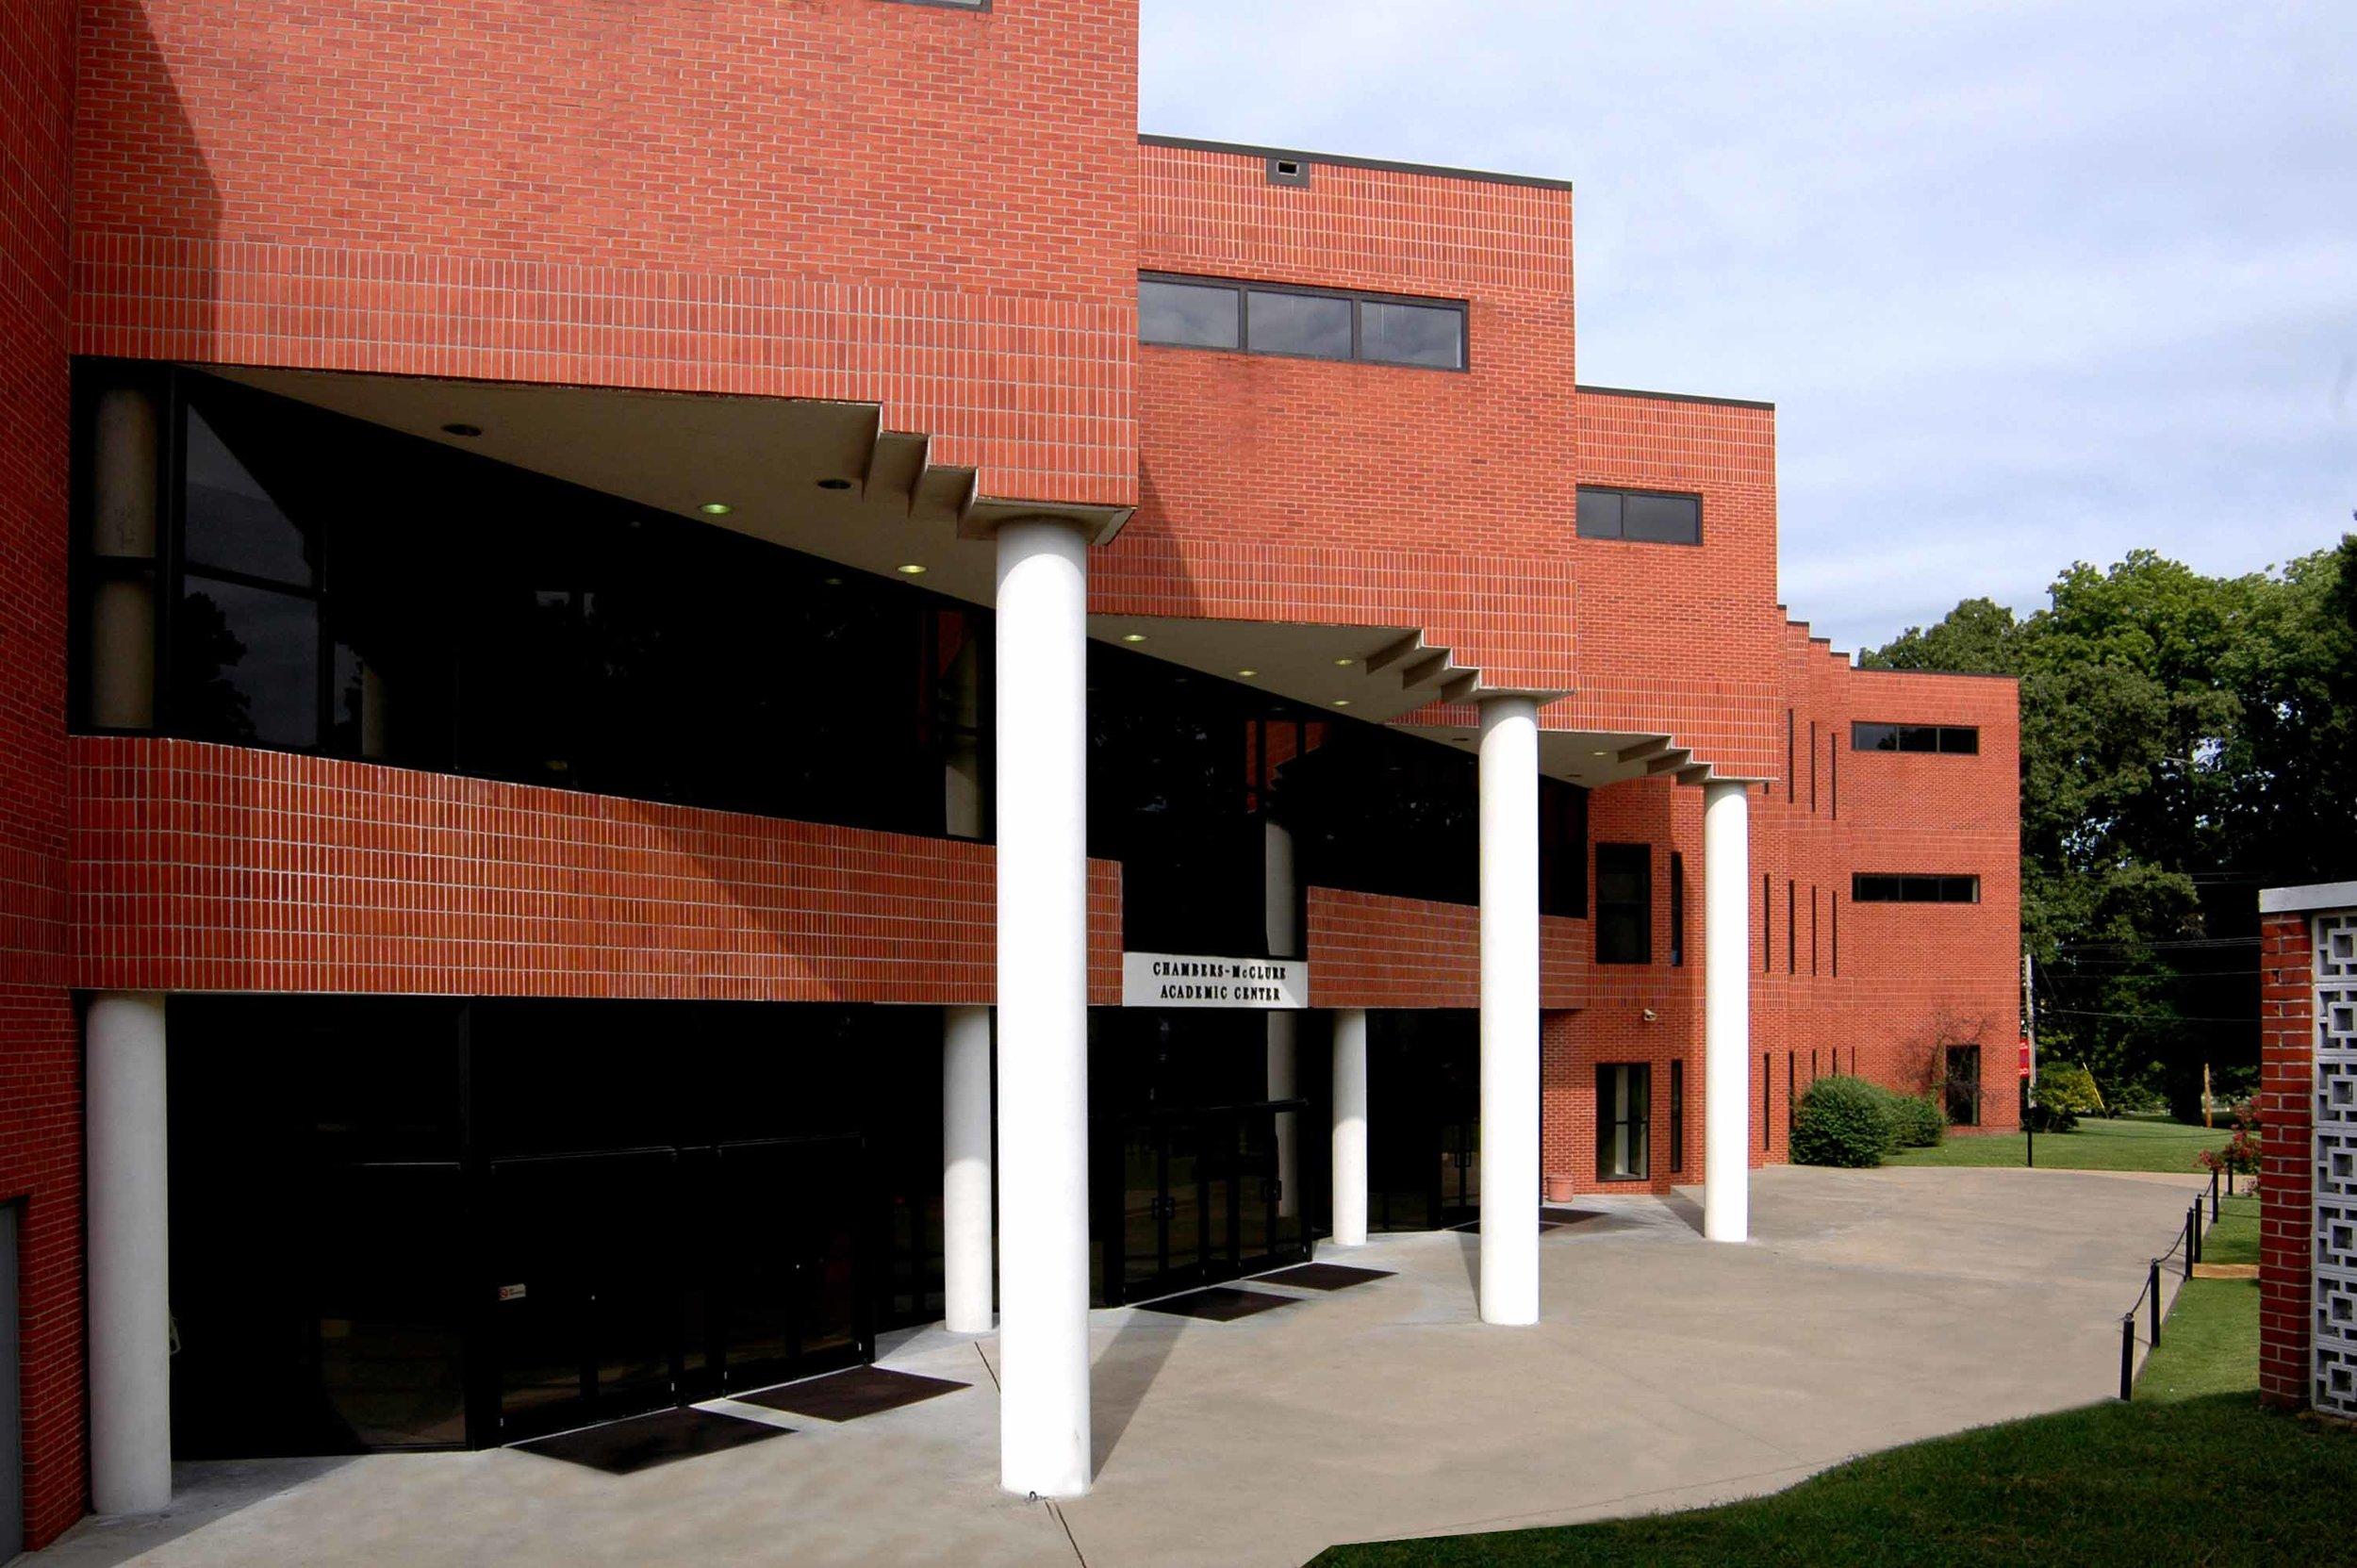 Lane College GMAC Building